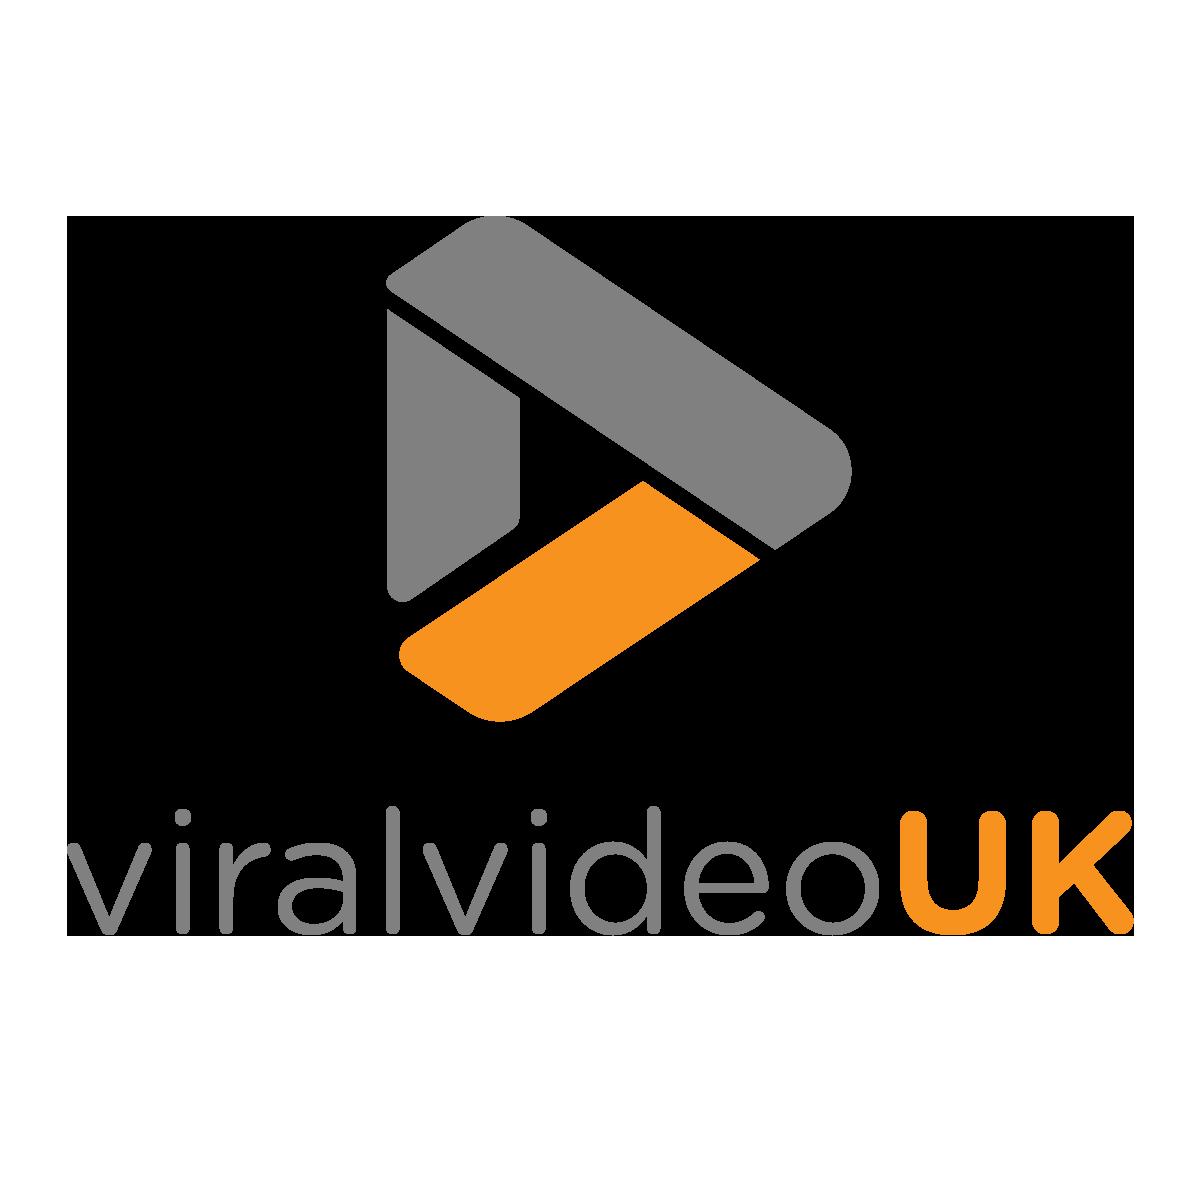 Viral Video UK